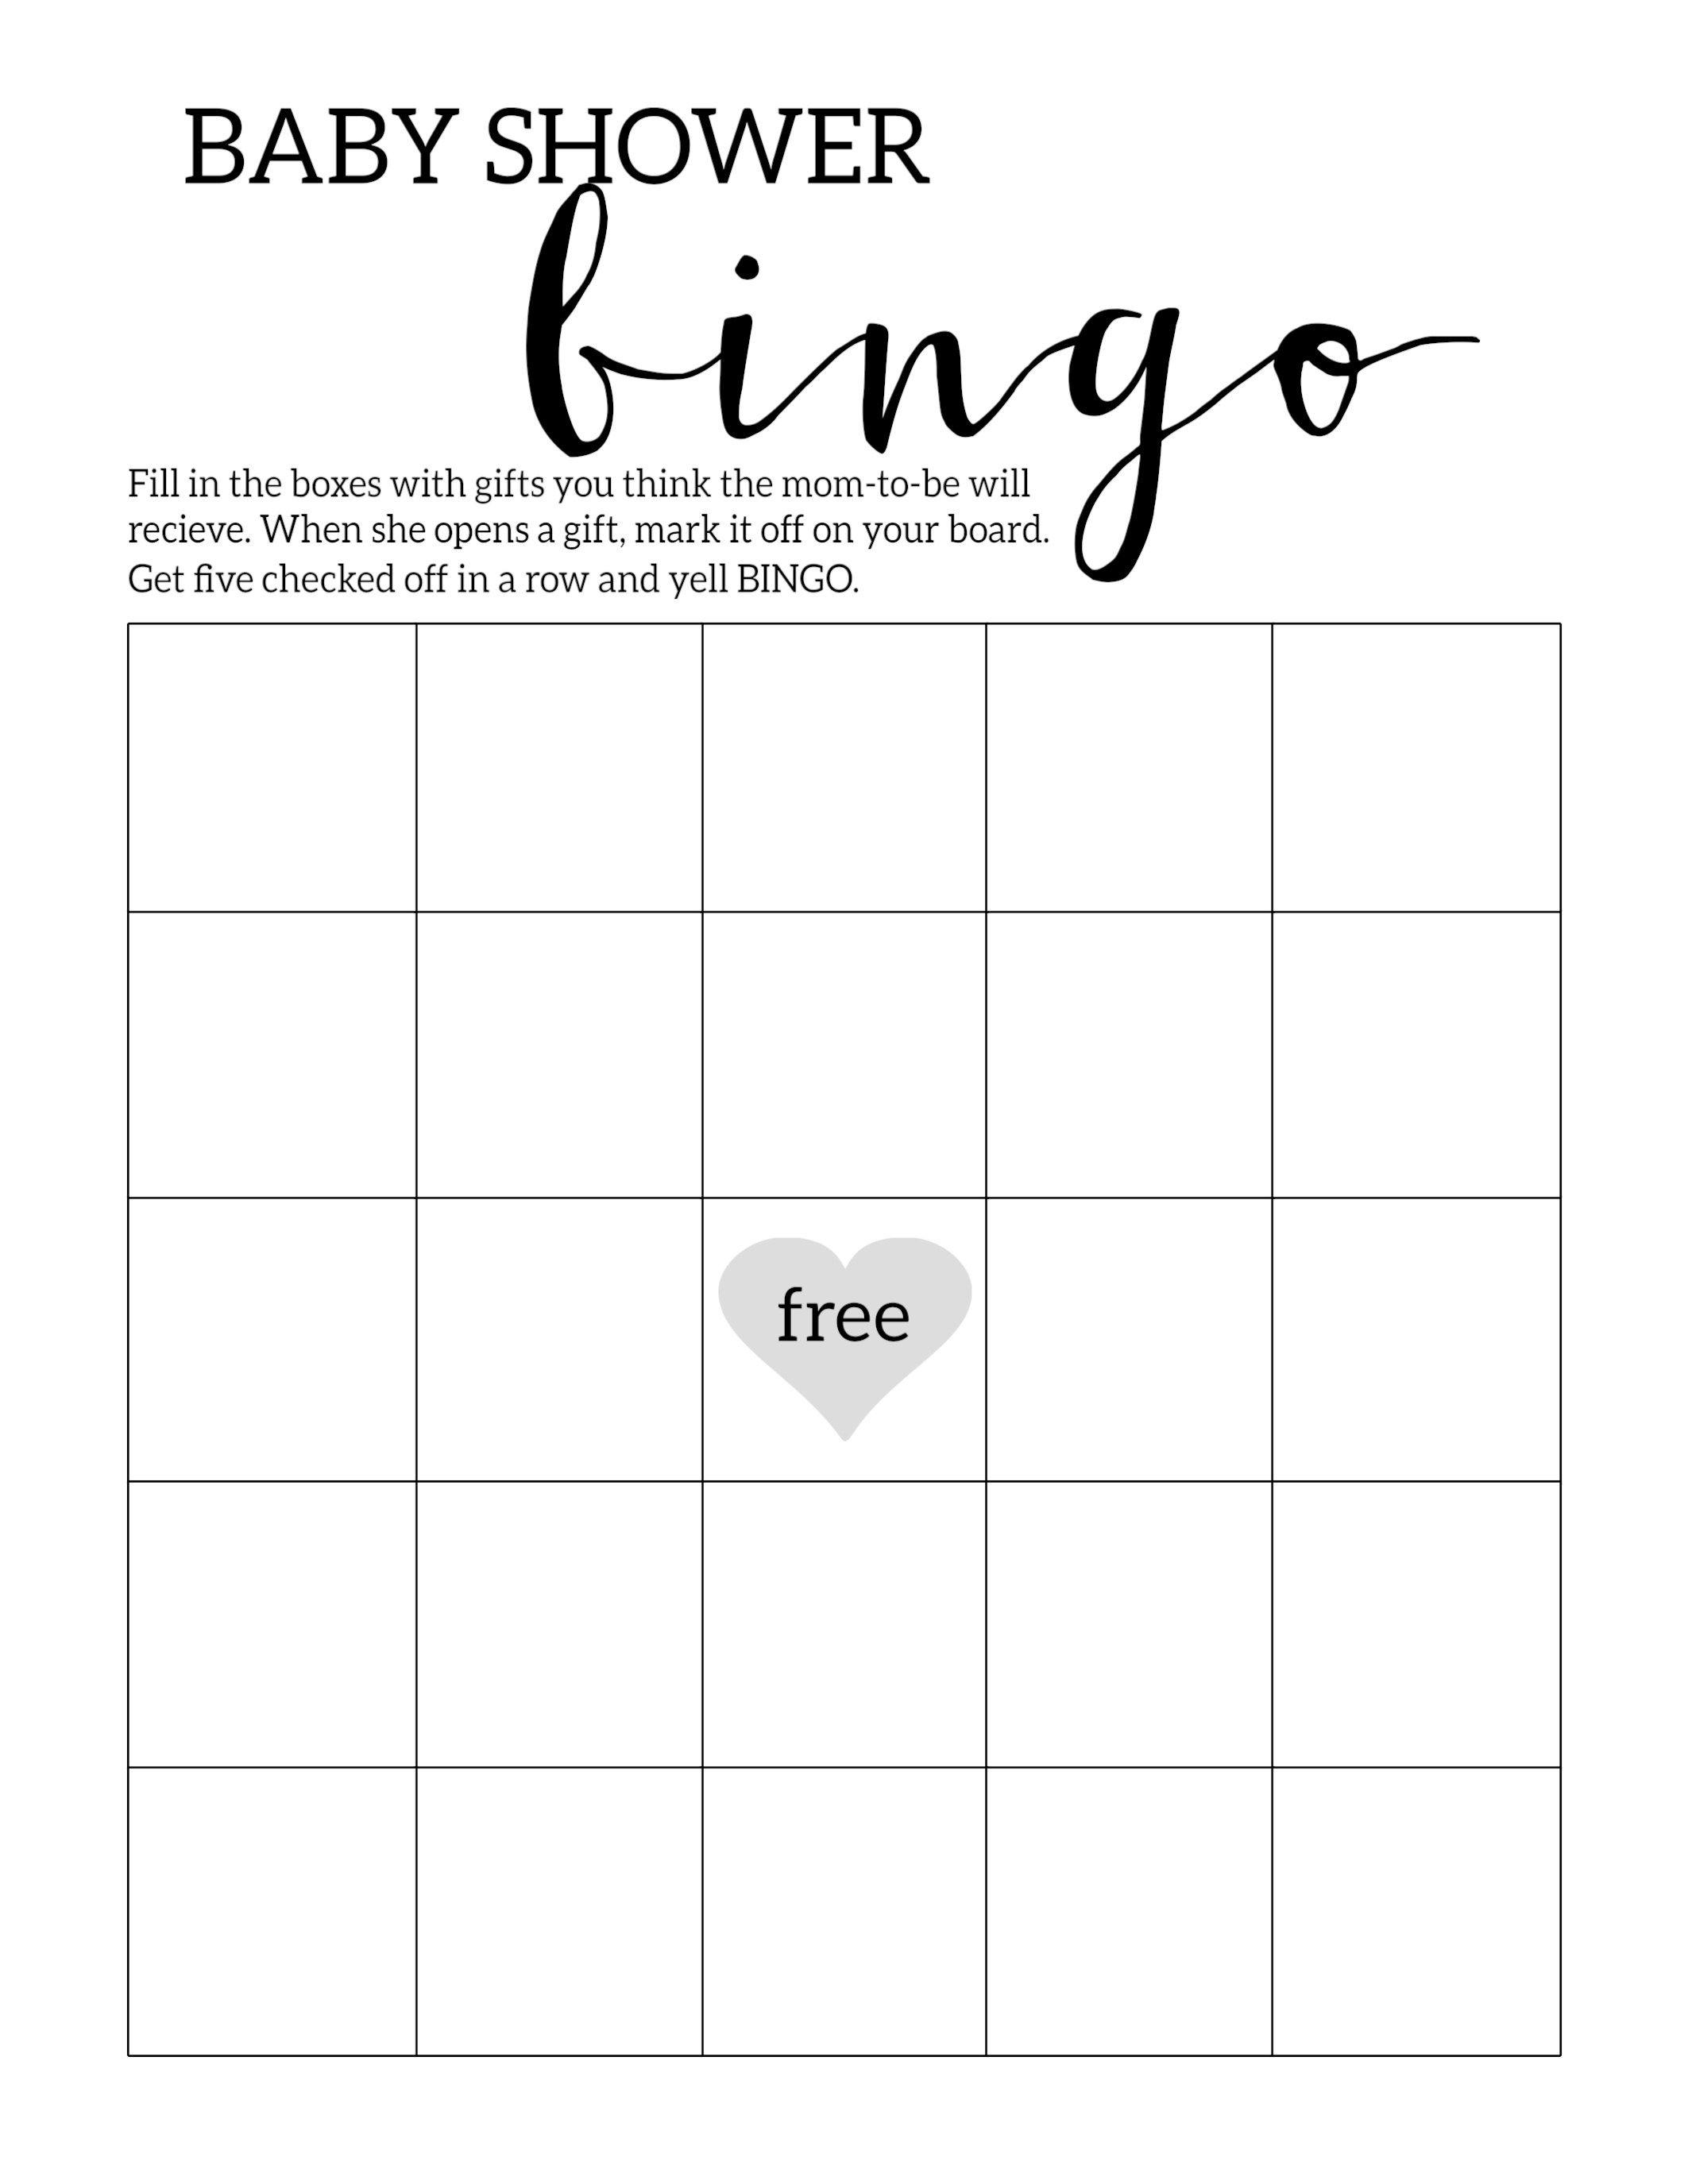 Baby Shower Bingo Printable Cards Template